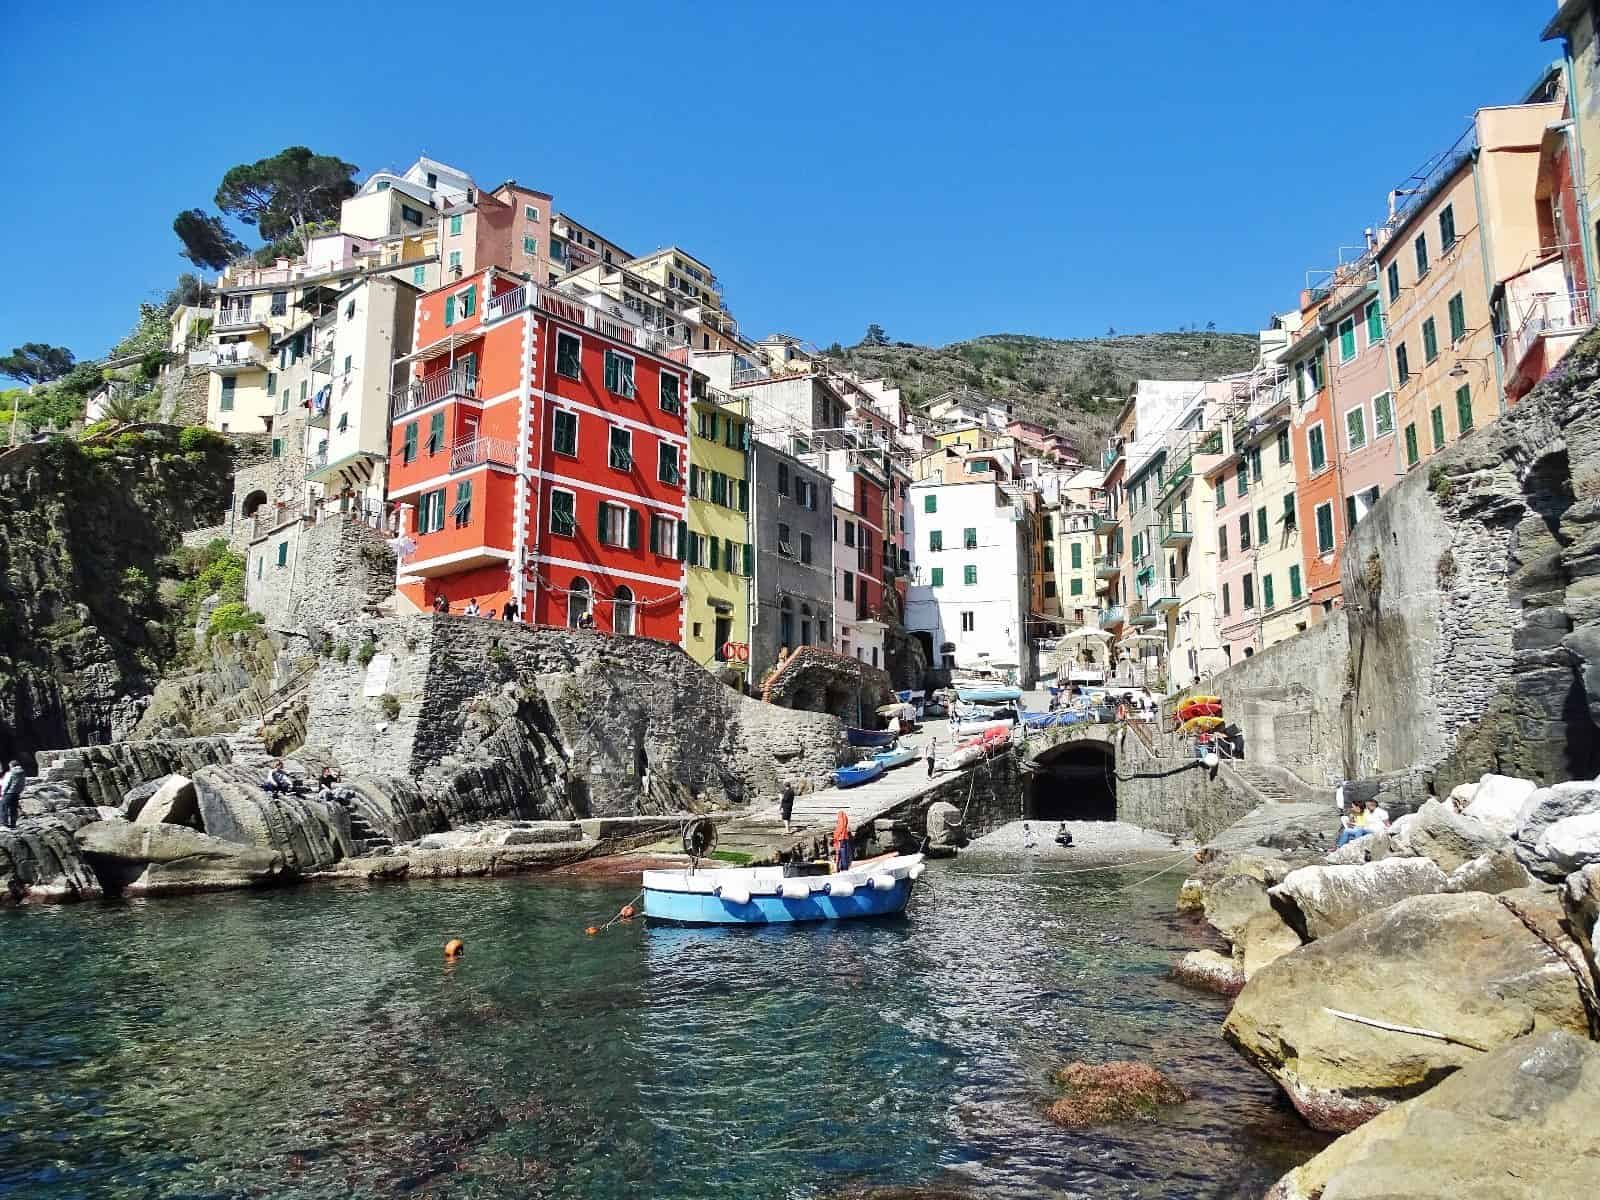 Leukste hotels Cinque Terre